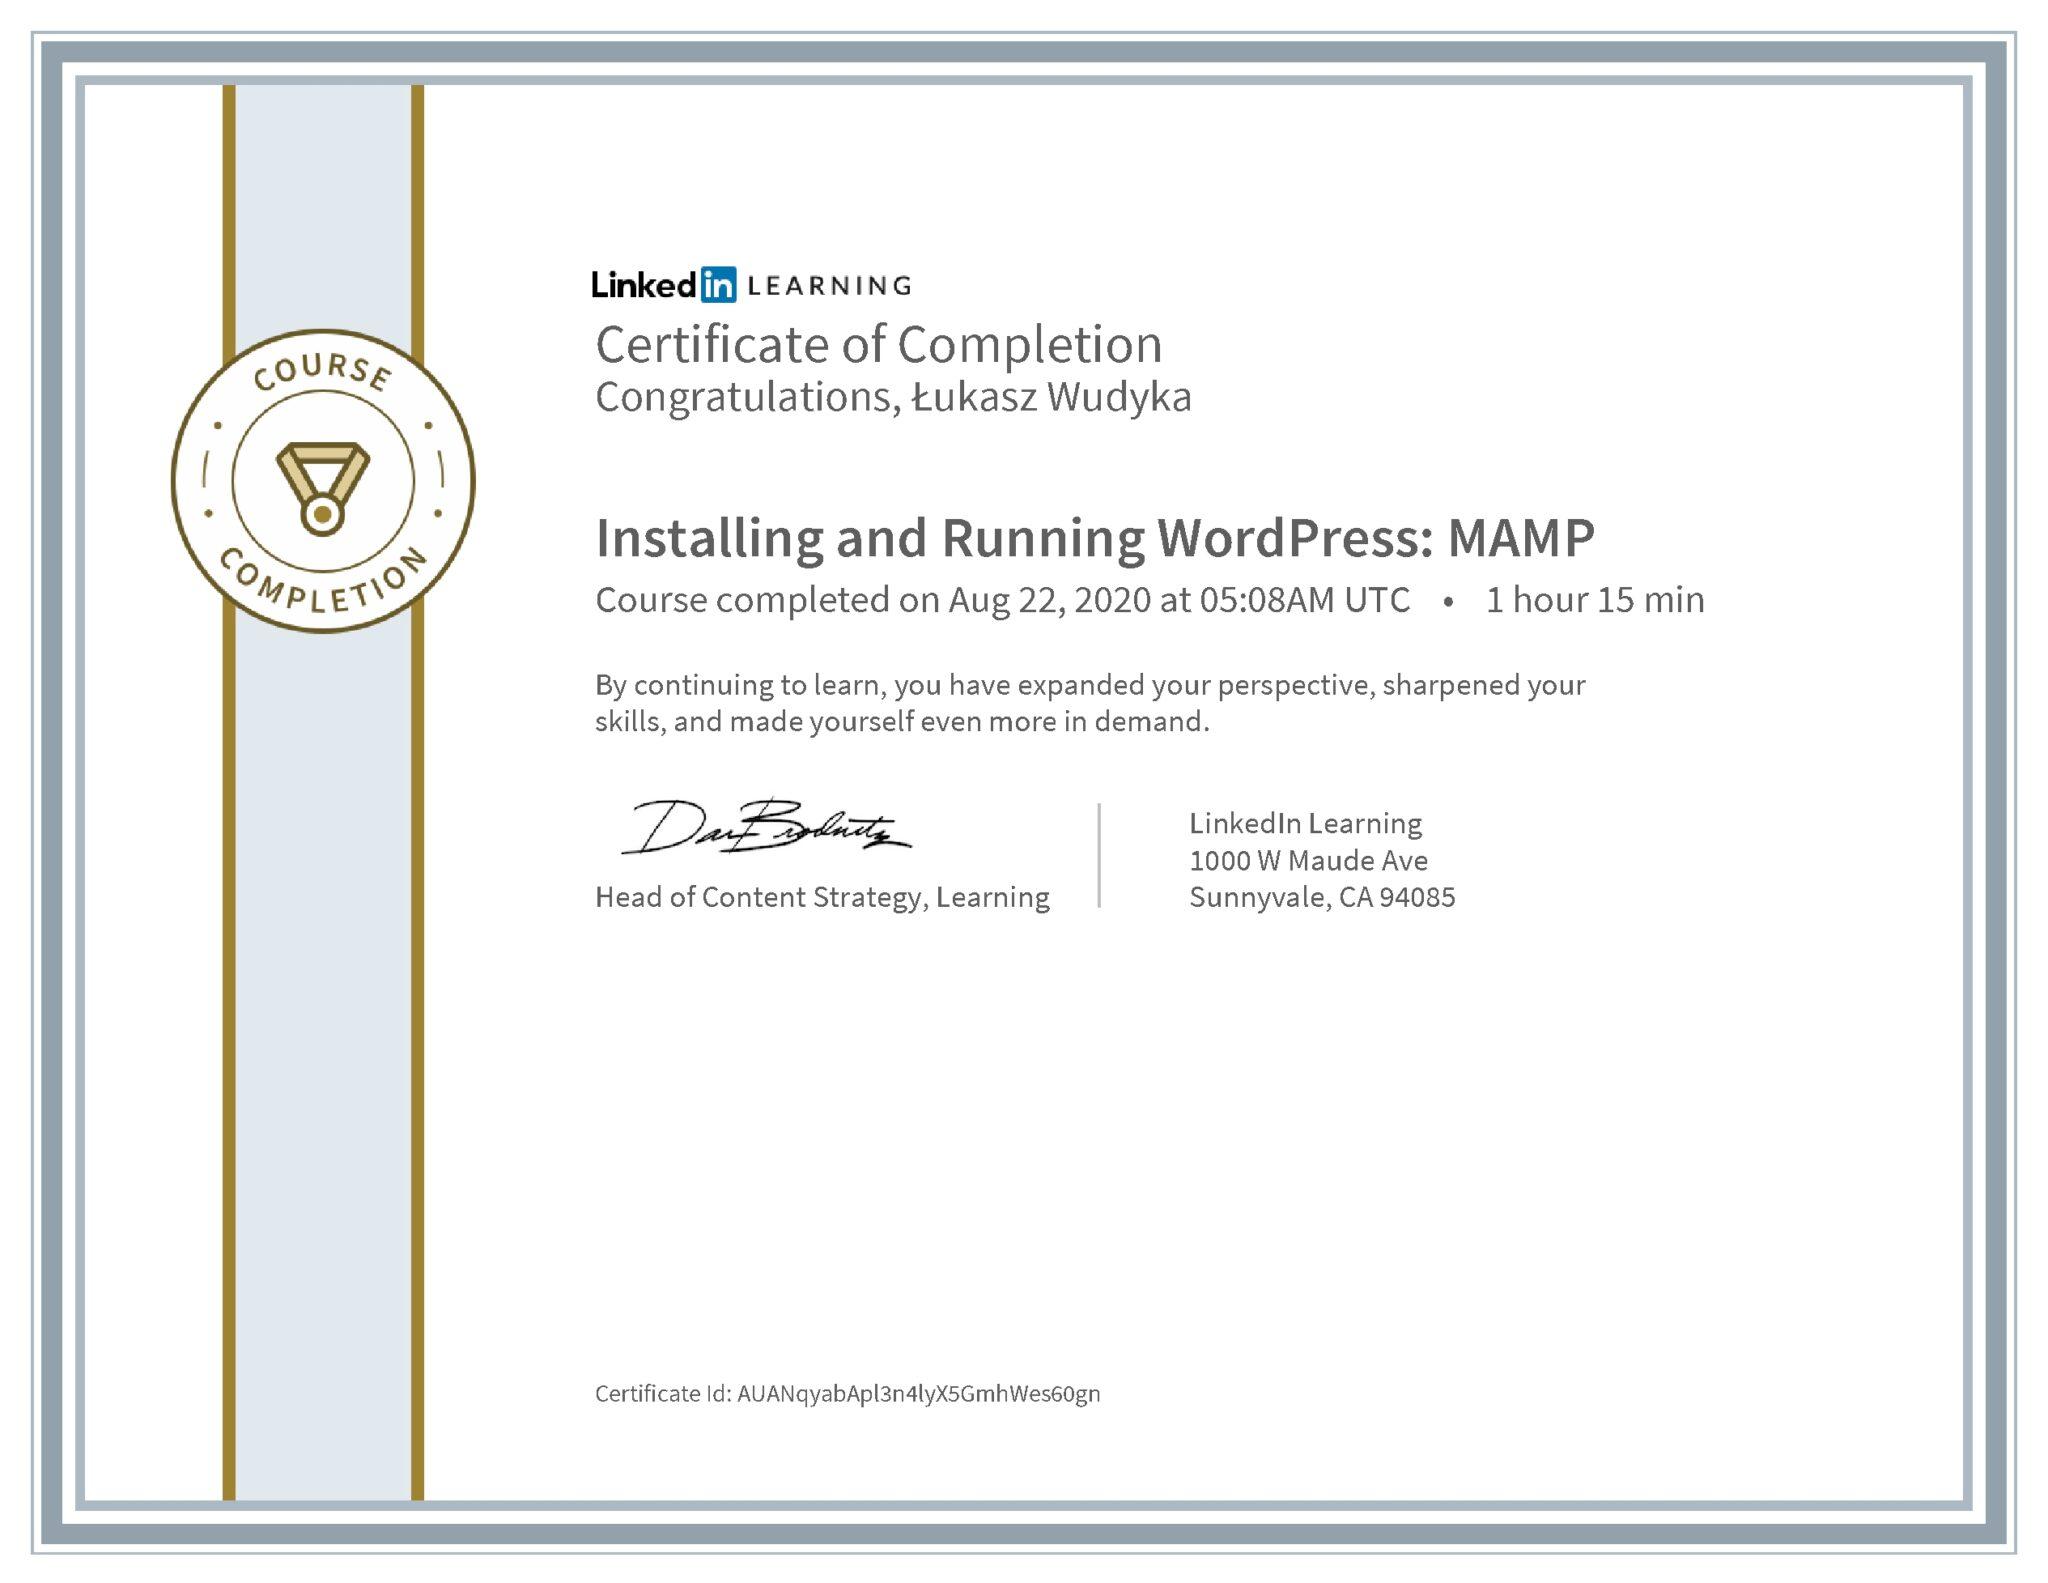 Łukasz Wudyka certyfikat LinkedIn Installing and Running WordPress: MAMP